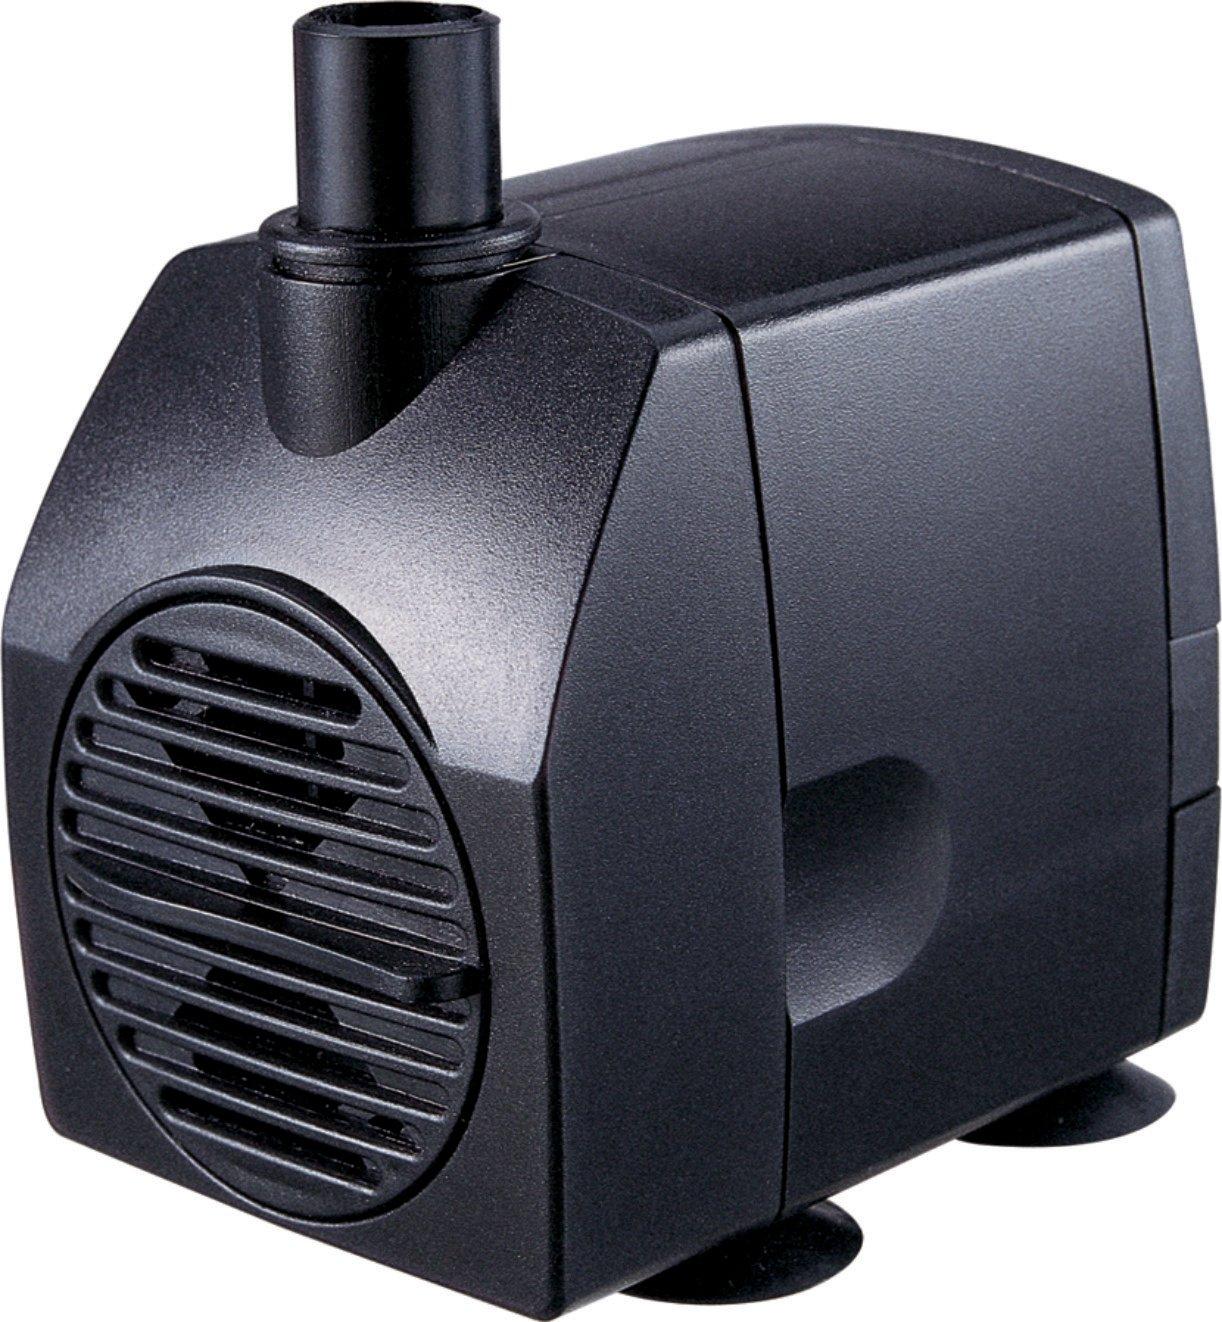 Jebao 650L//hr Teichpumpe Wasserspielpumpe #WP650